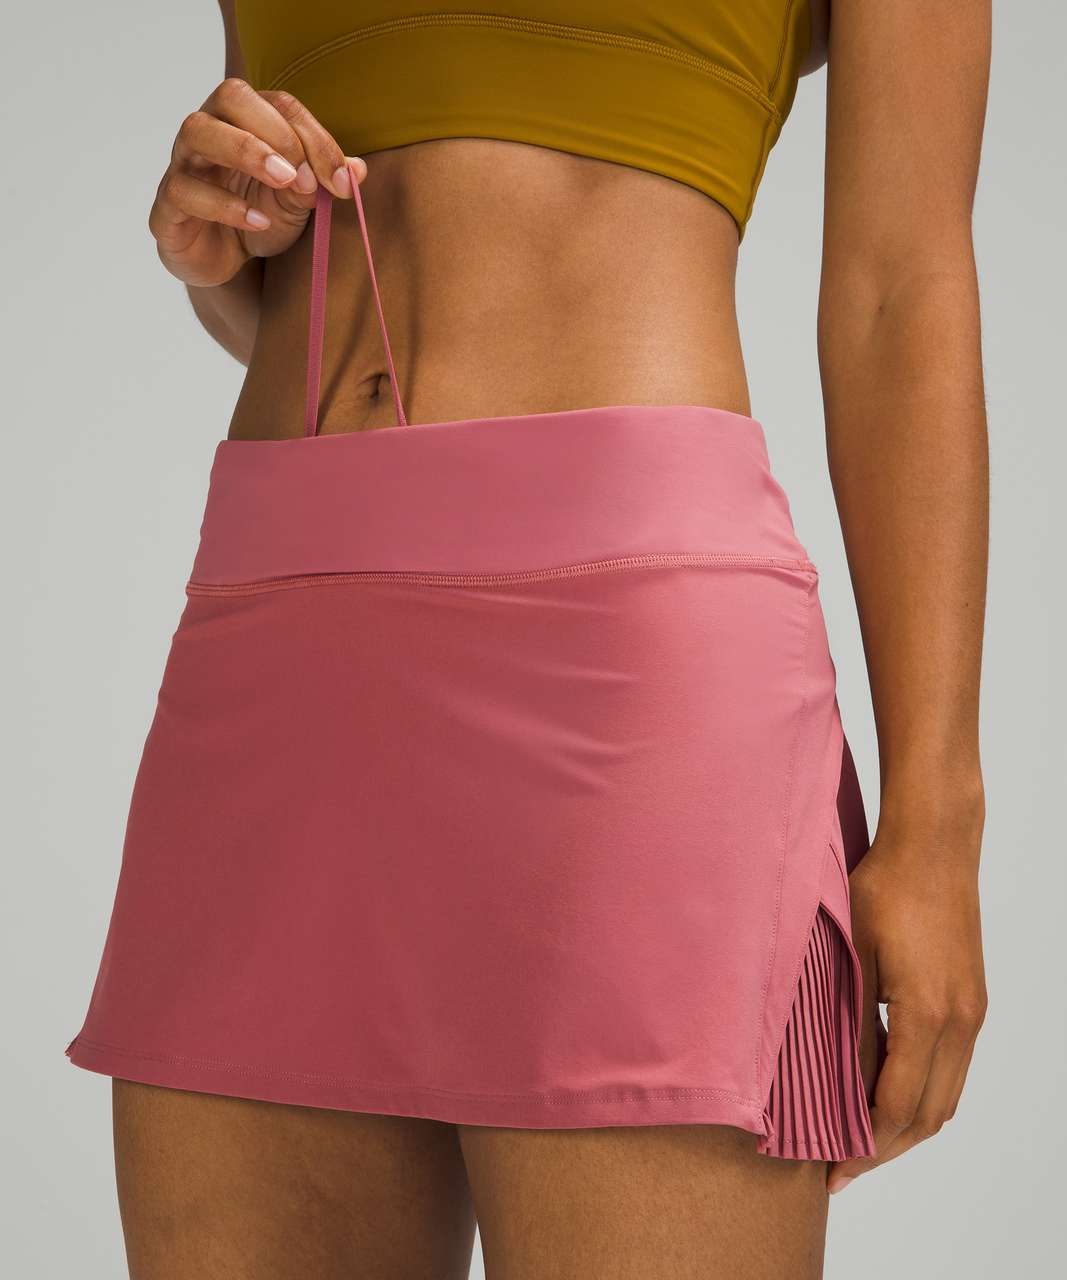 Lululemon Play Off The Pleats Mid Rise Skirt - Brier Rose